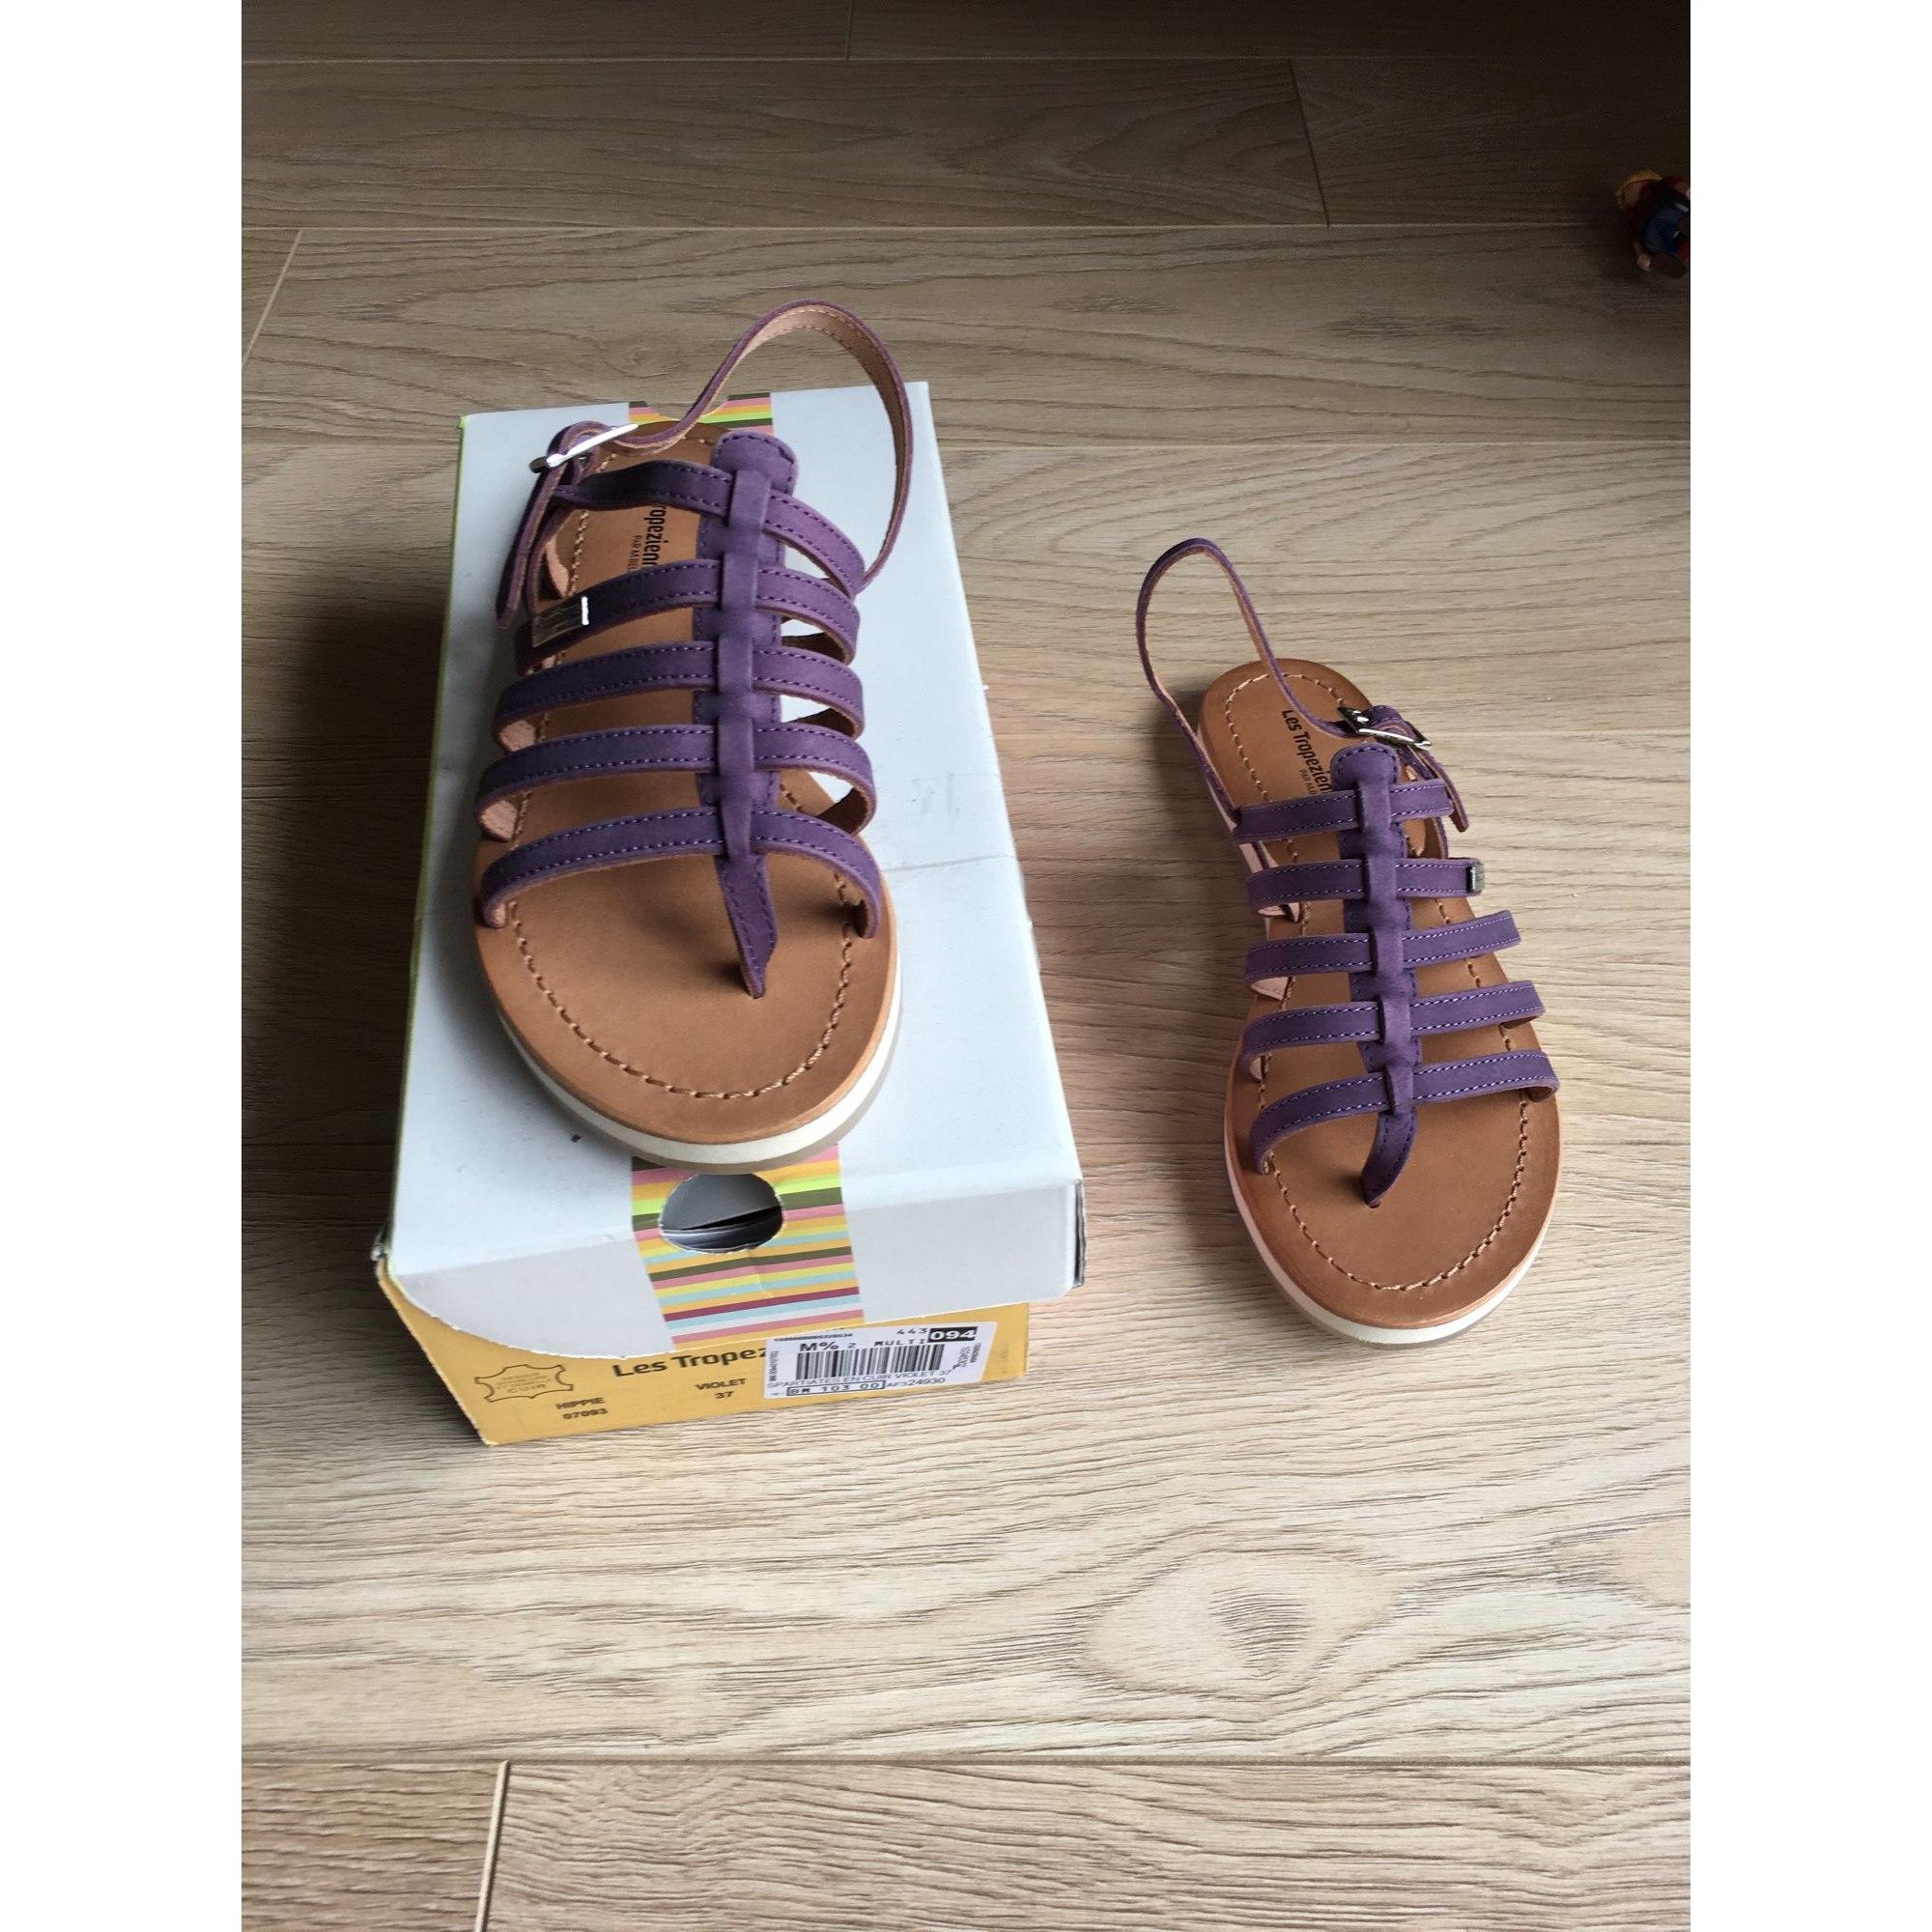 Tropezienne Tropezienne Sandales Tropezienne Violette Violette Sandales Violette Sandales clFJ1K